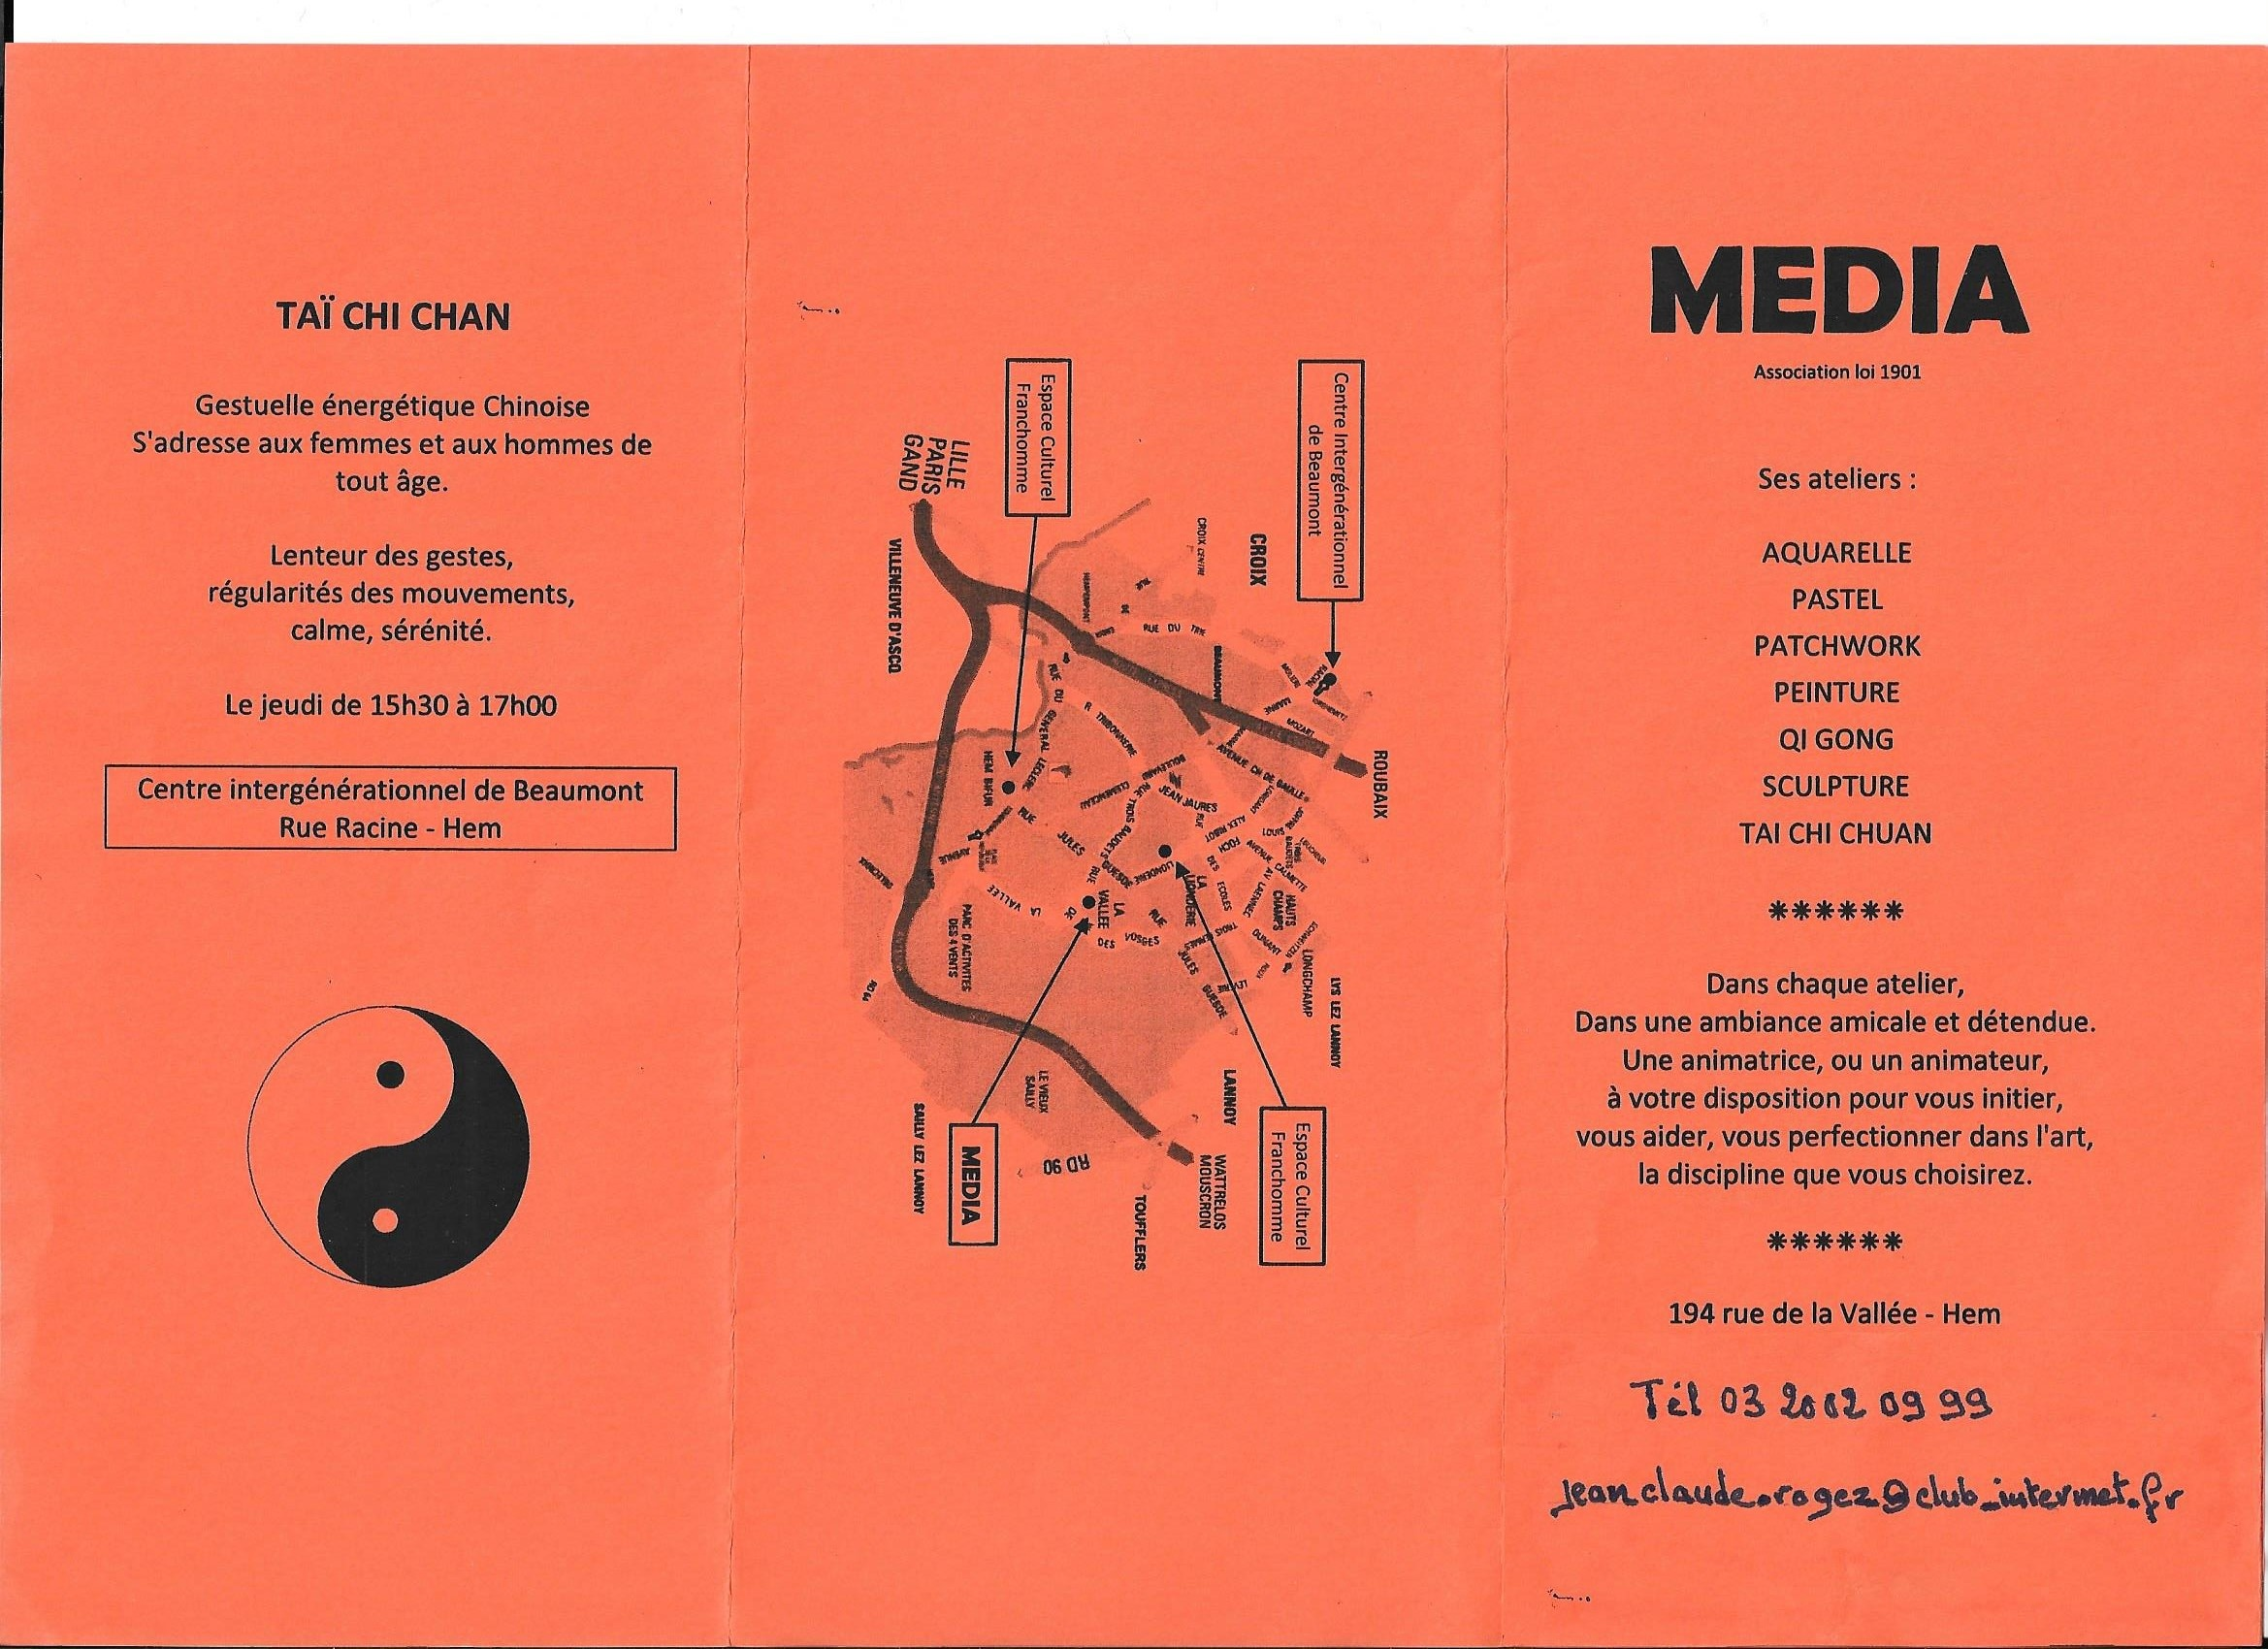 Association Média